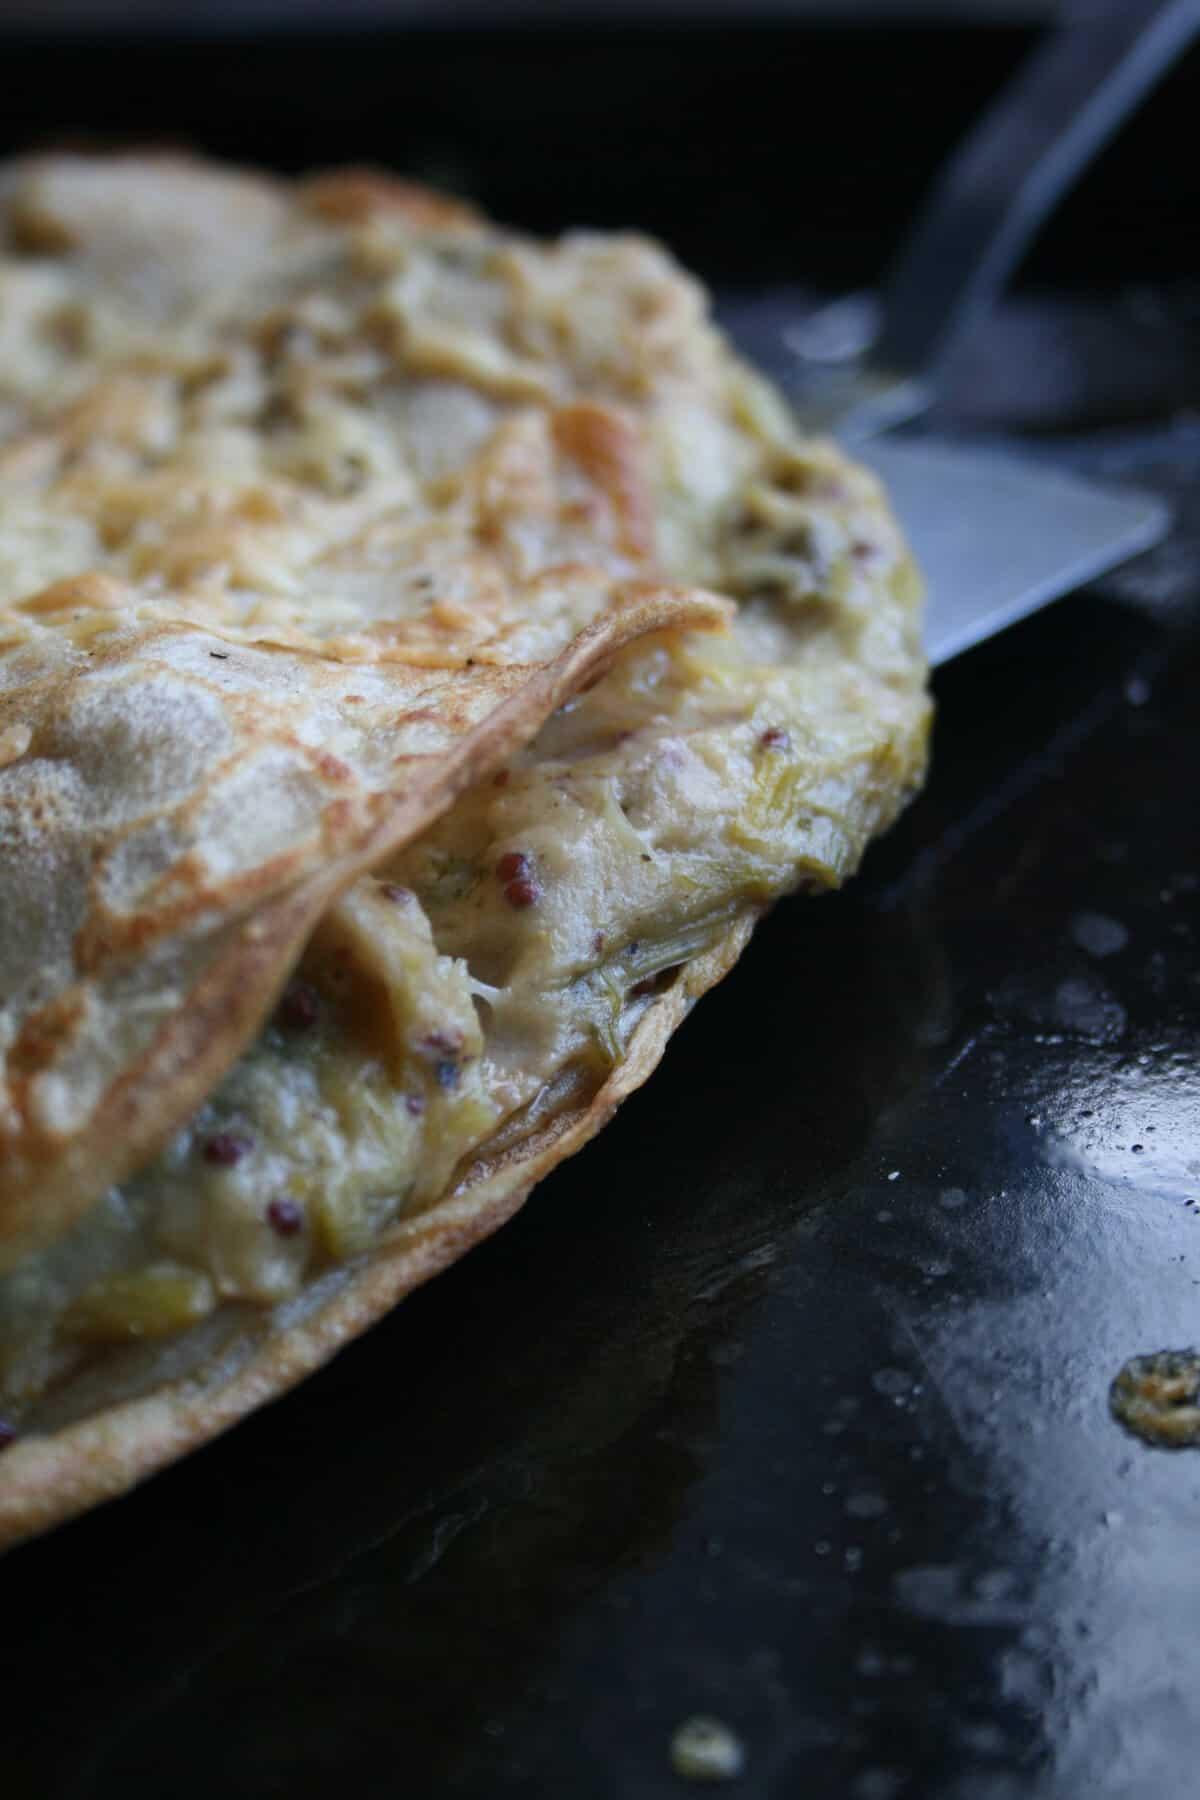 Chicken, Leek and Wholegrain Mustard Buckwheat Pancakes - crispy baked buckwheat pancakes with a super savoury filling   eatloveeats.com